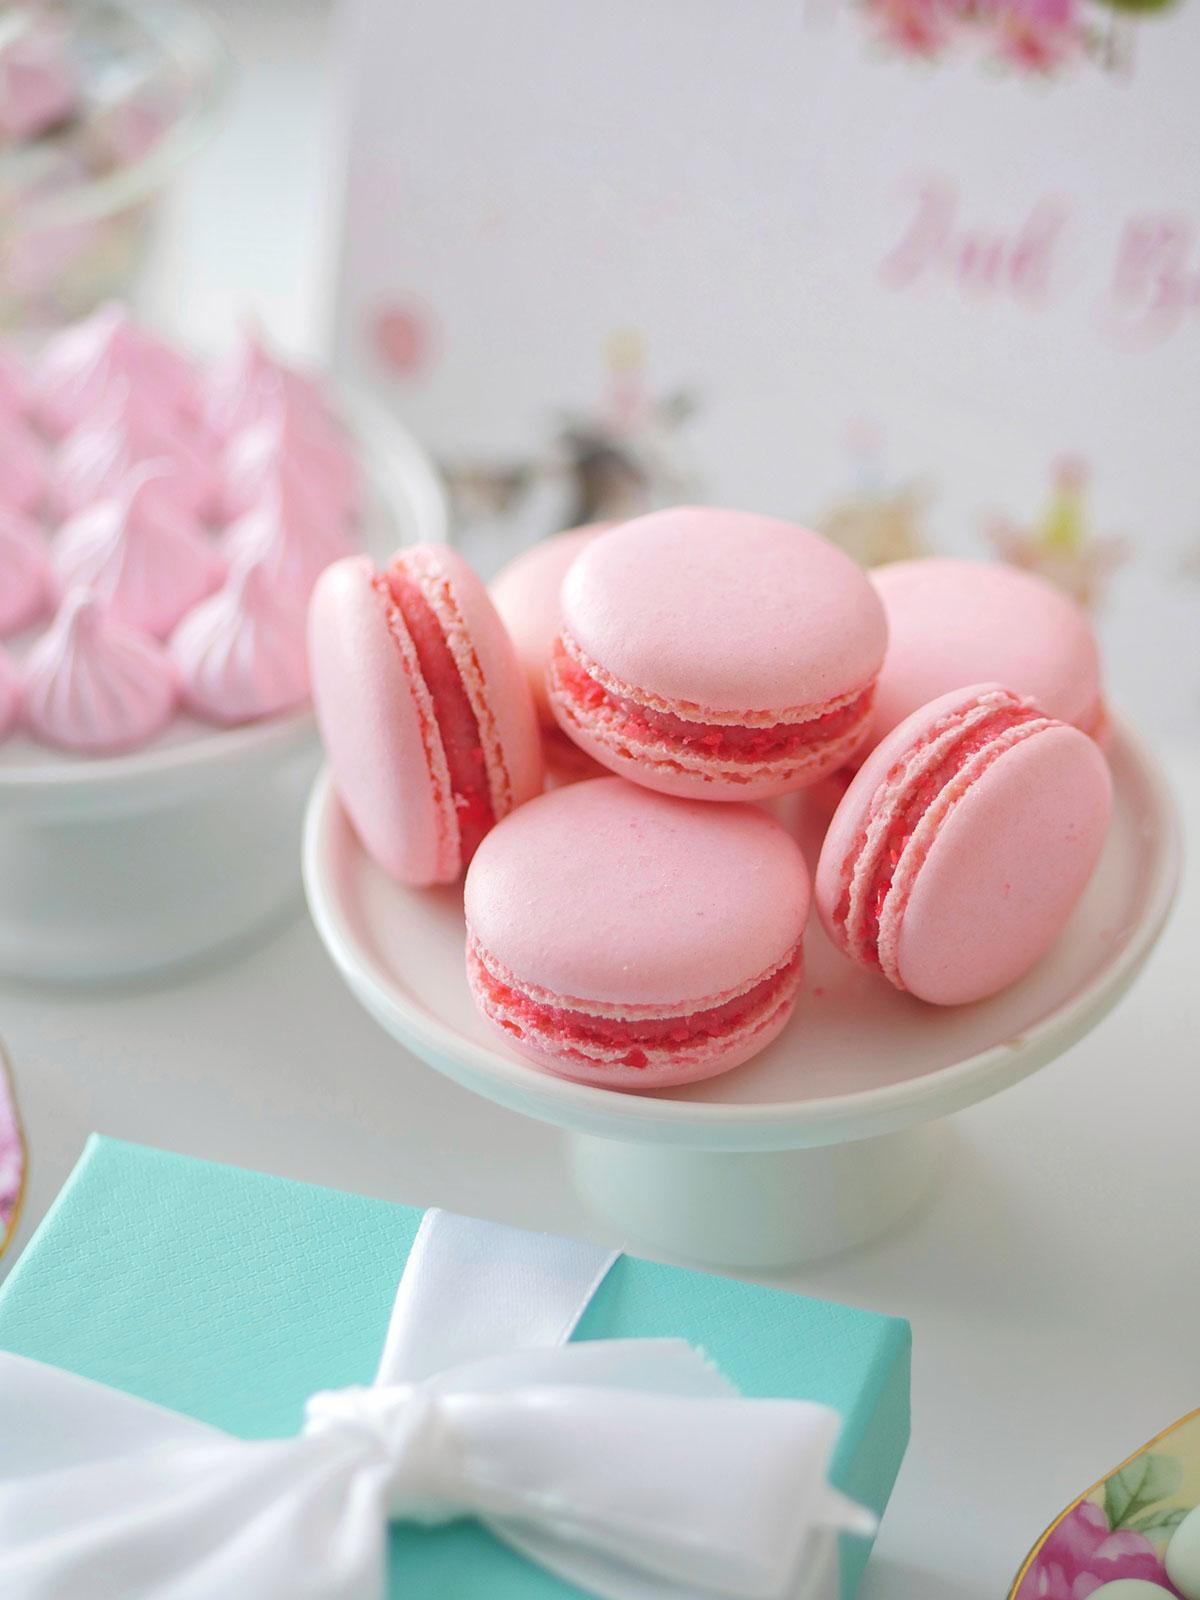 Macarons on a mini cake stand.